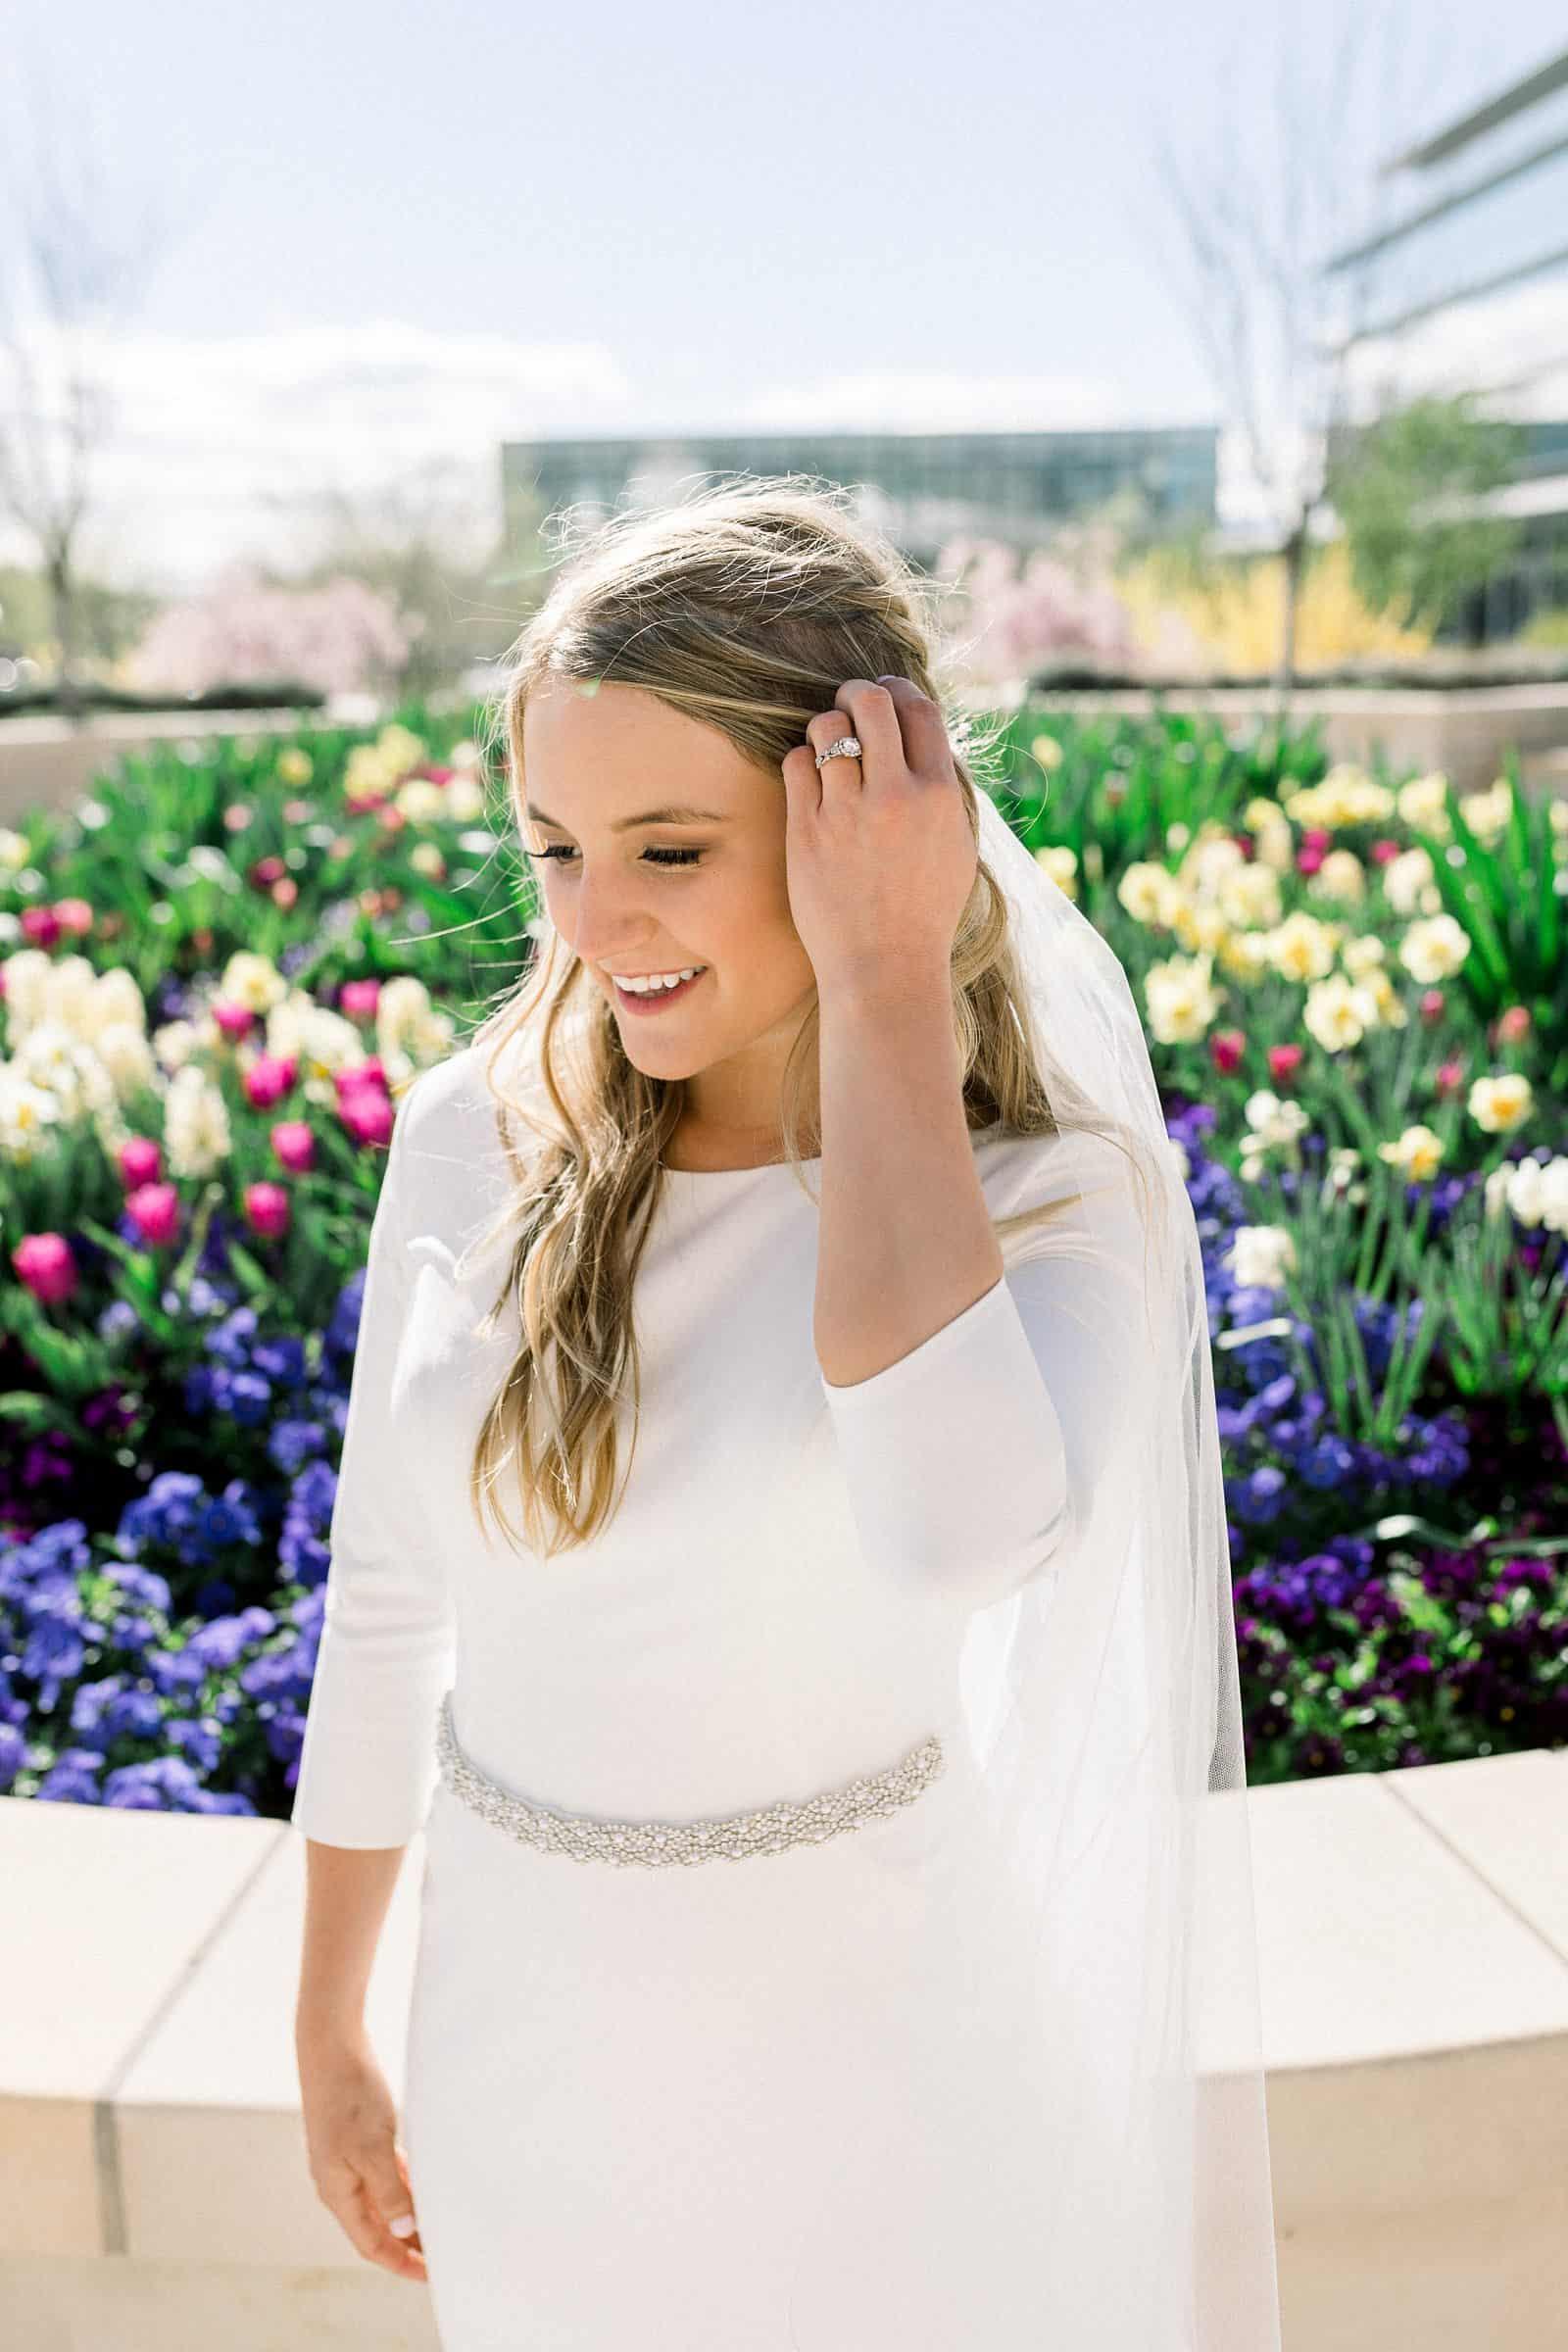 spring wedding tulips, modest wedding dress, spring bride, wedding ring, engagement ring, long wedding hairstyle, LDS bride, modern wedding dress